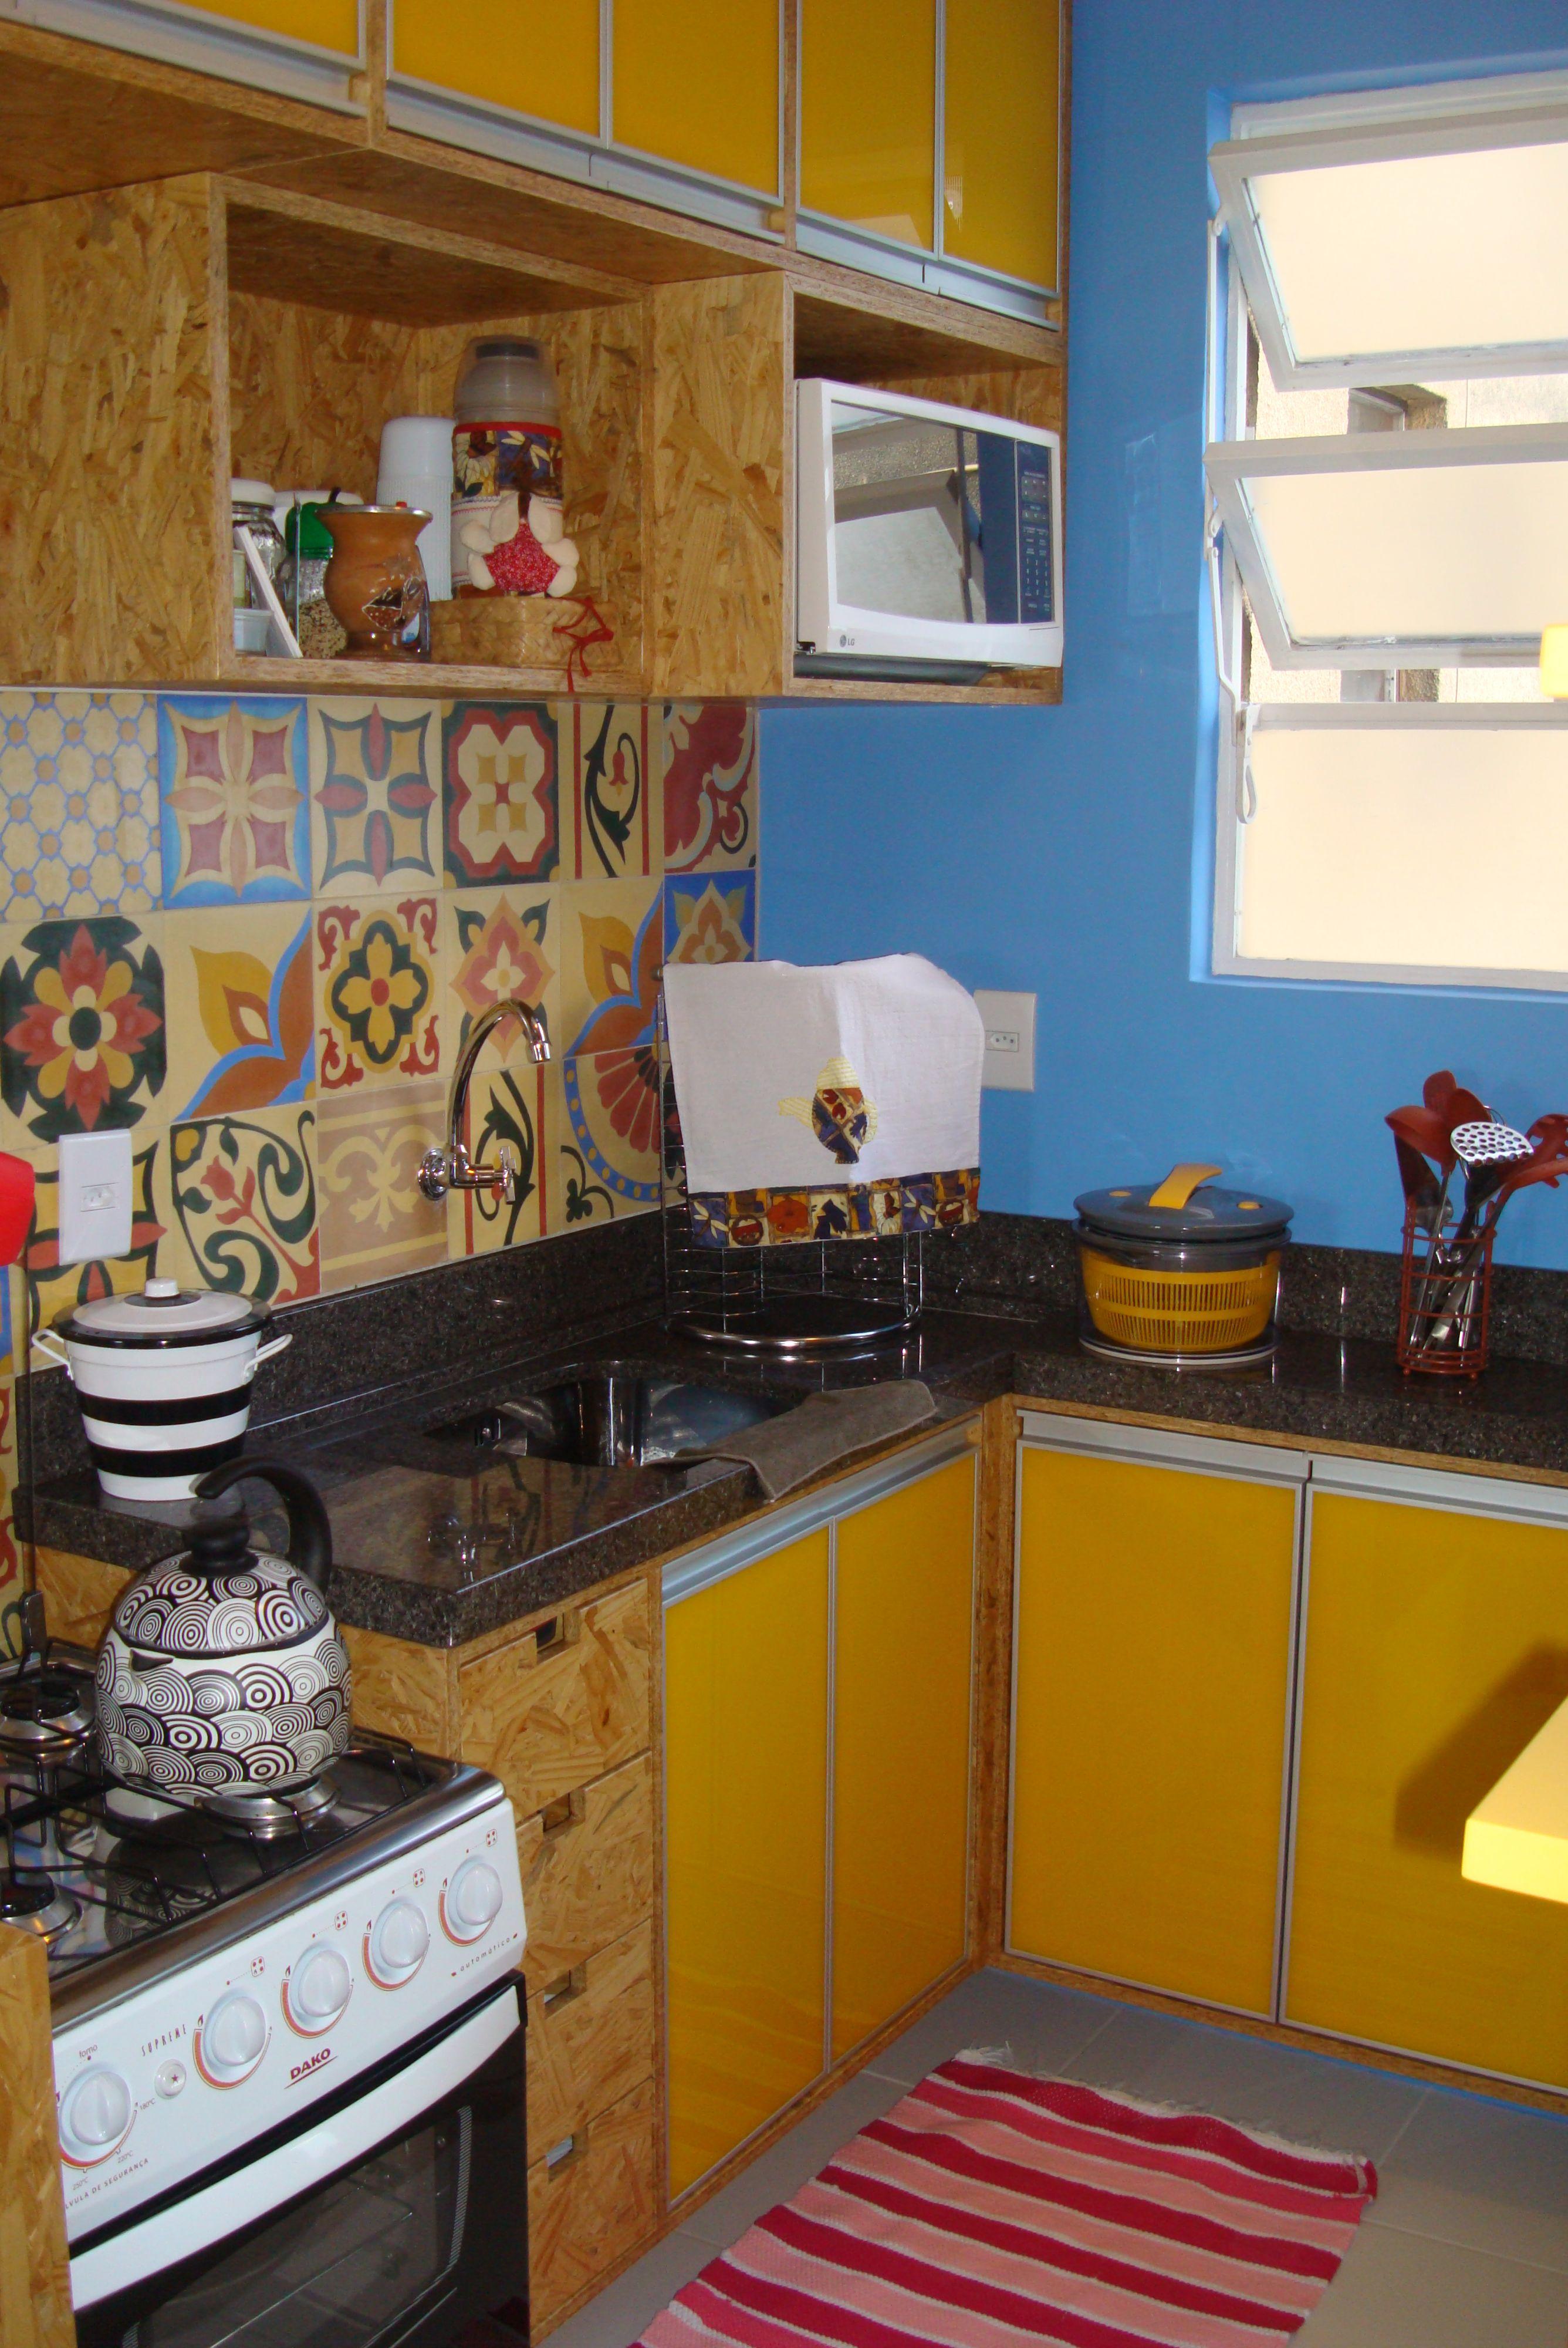 cozinha osb - Pesquisa Google